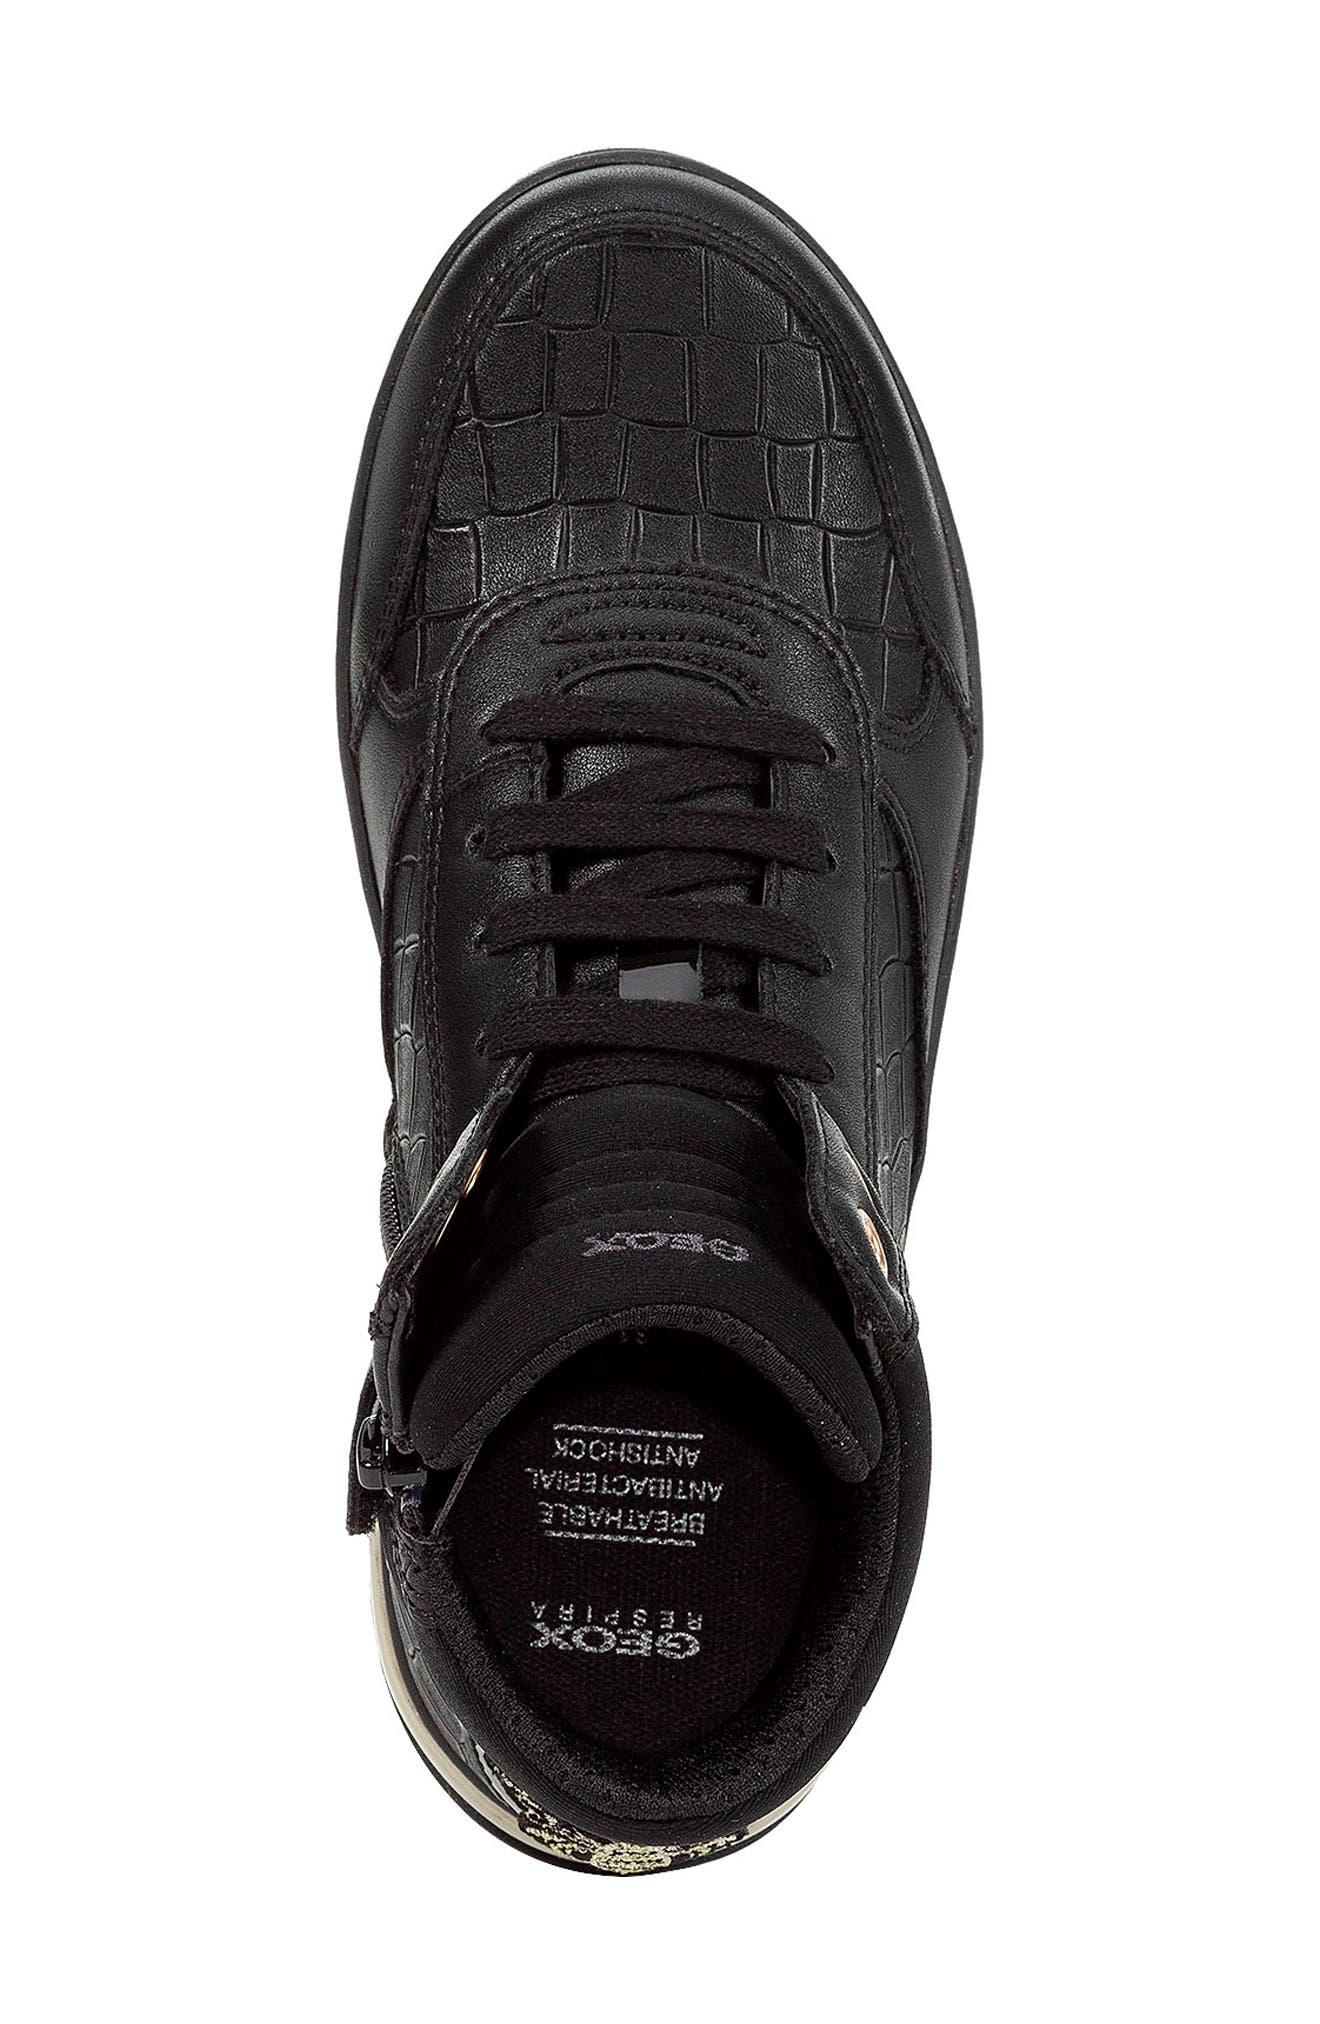 Aveup High Top Sneaker,                             Alternate thumbnail 5, color,                             BLACK